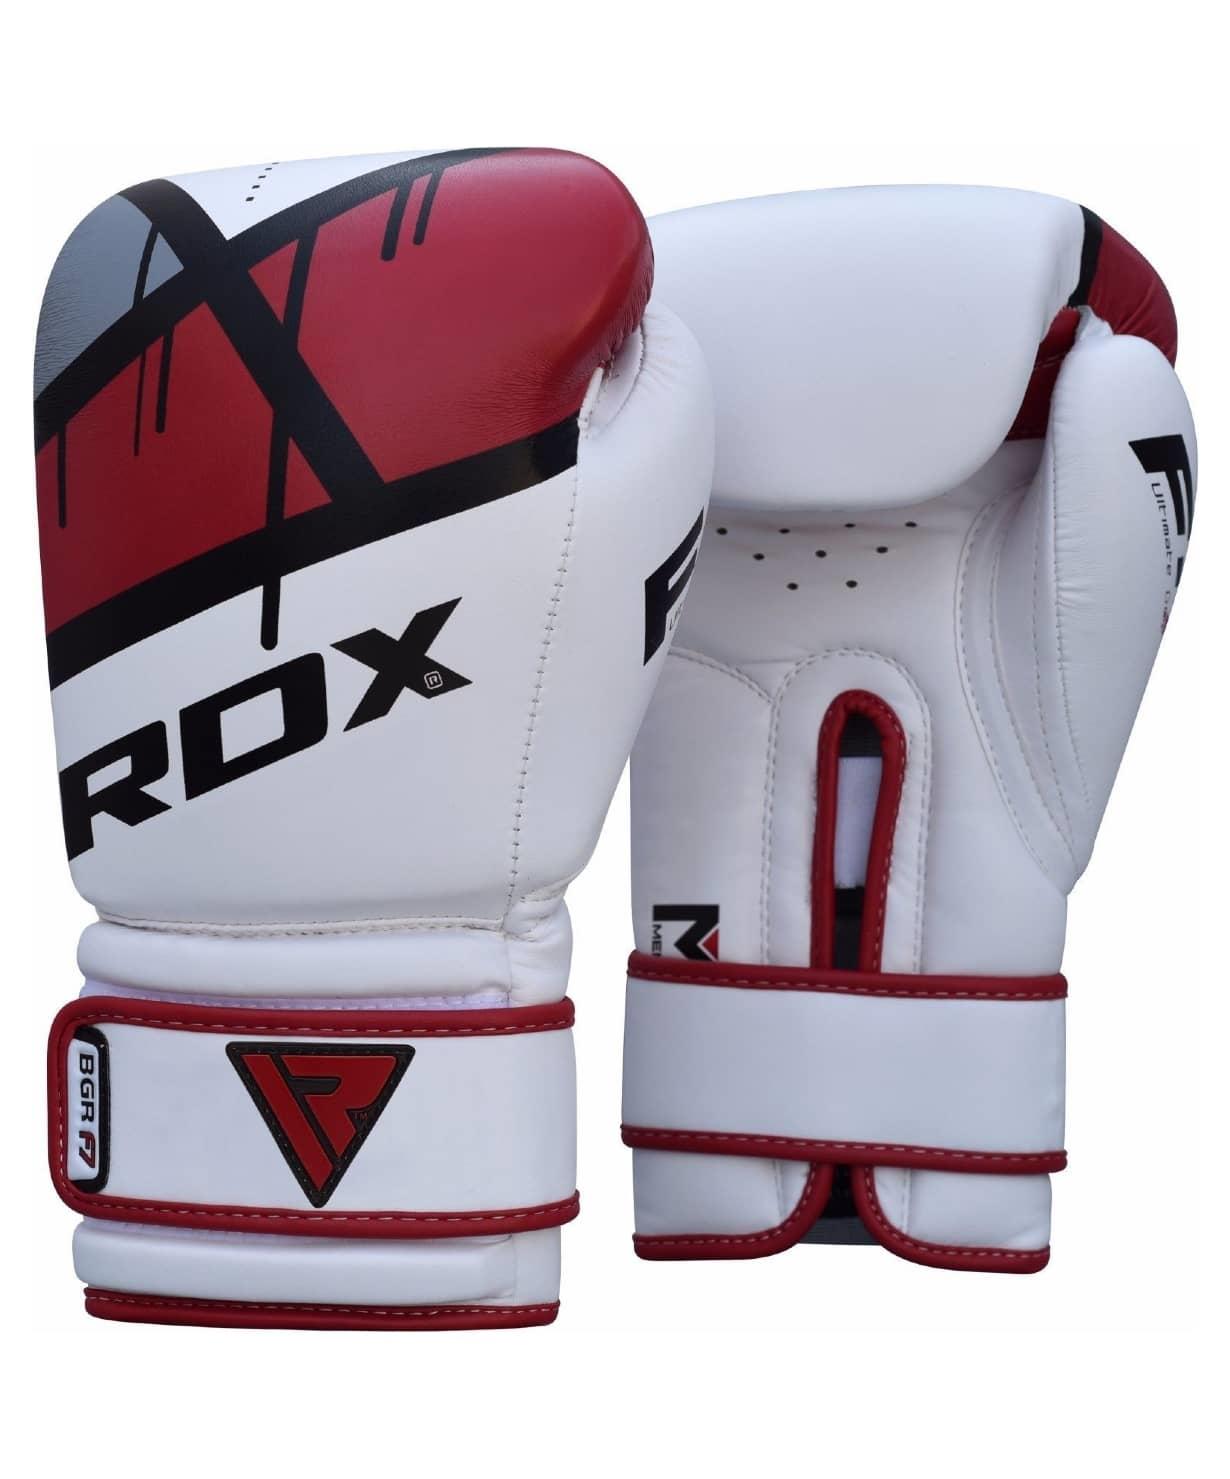 Перчатки боксерские BGR-F7 RED BGR-F7R, 12 oz